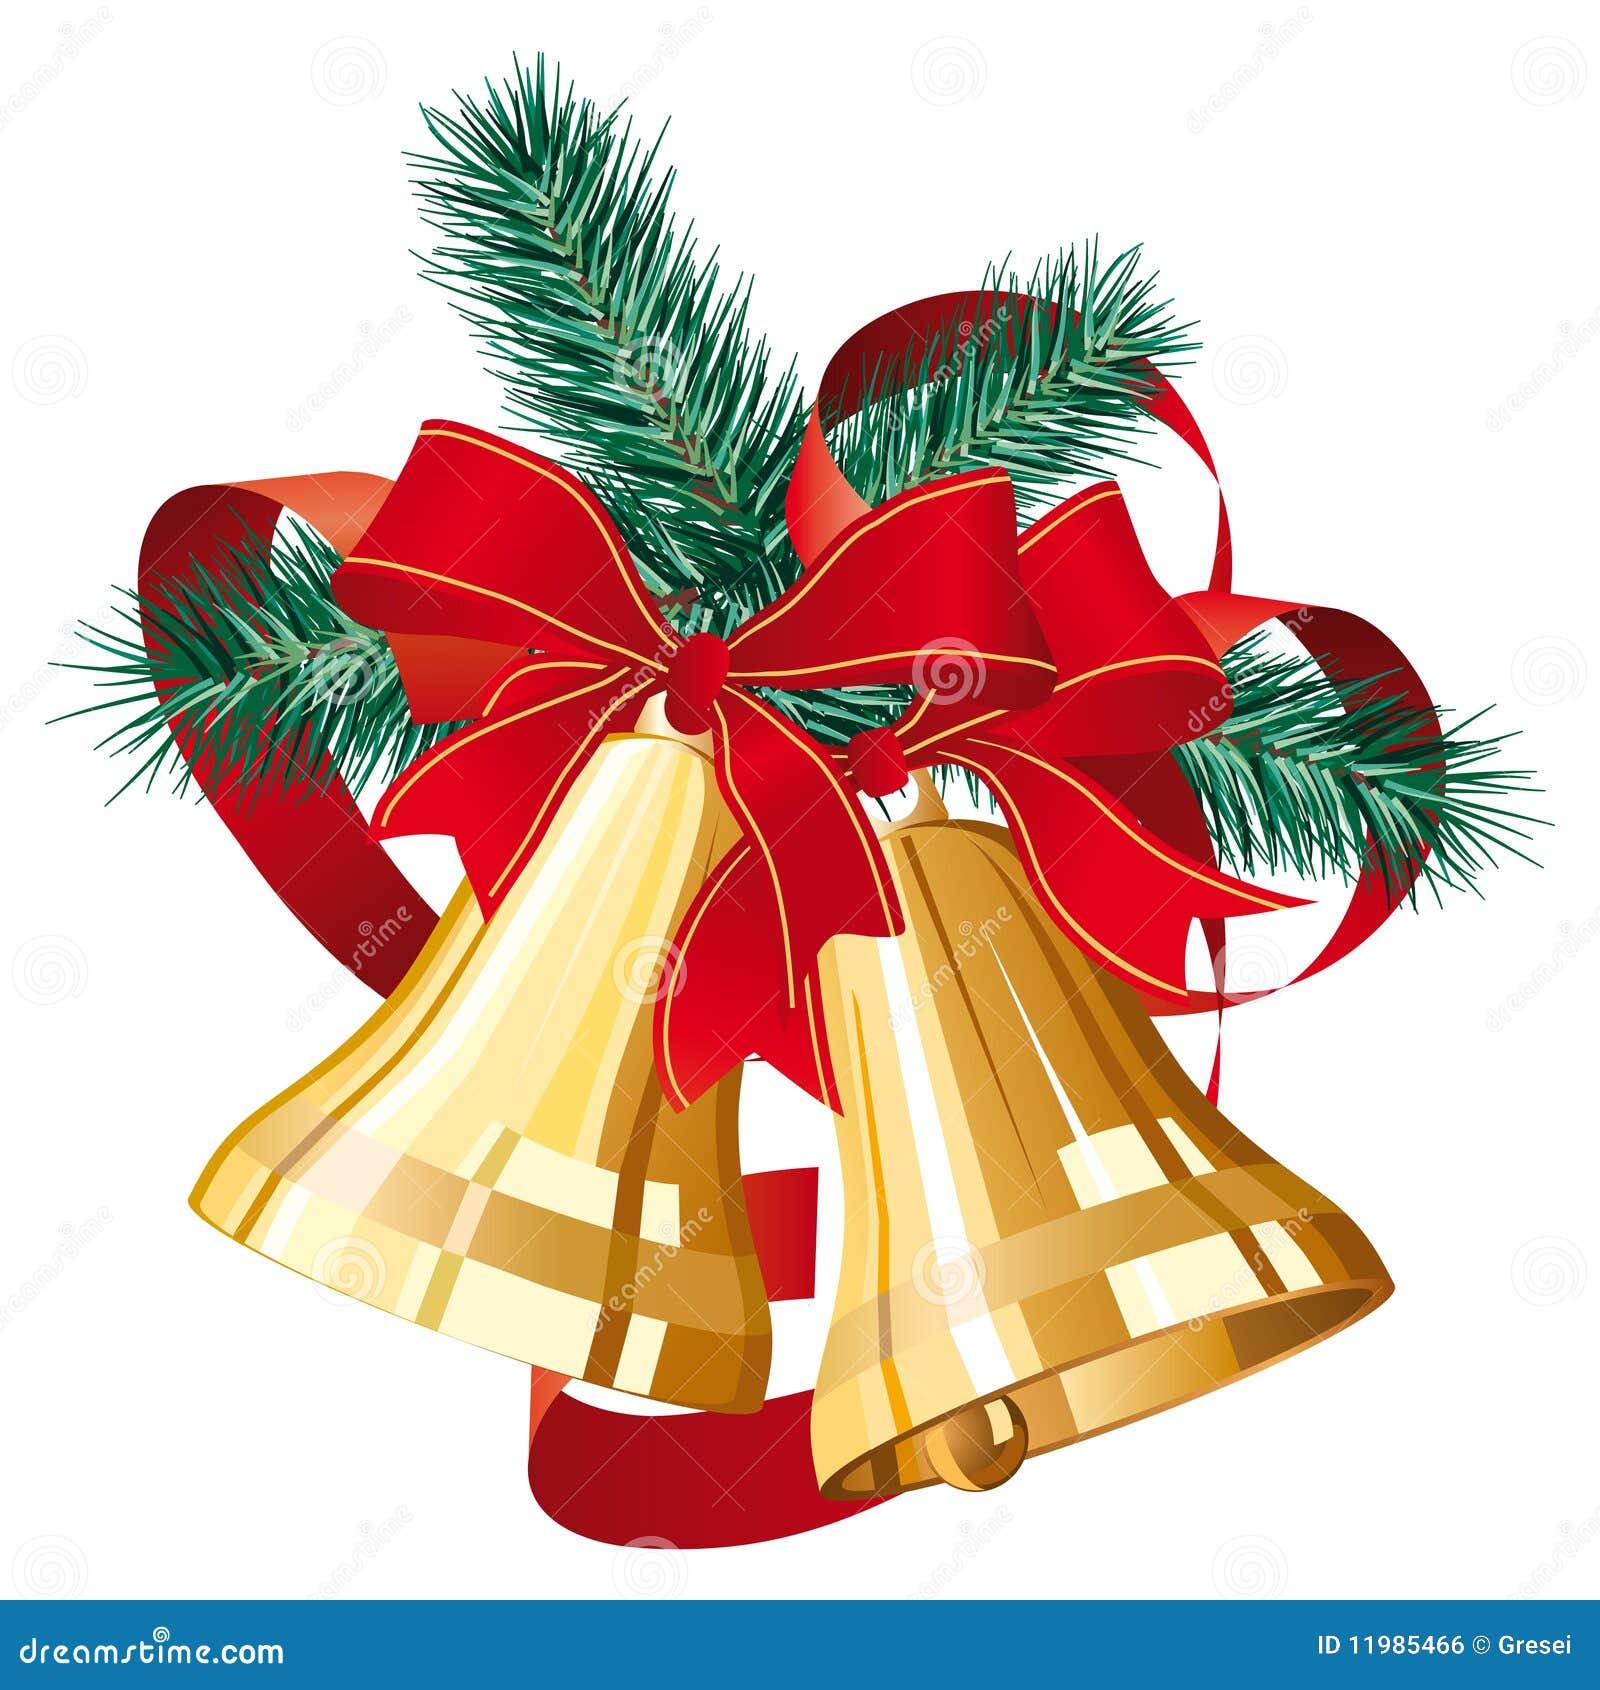 christmas bells stock vector illustration of green. Black Bedroom Furniture Sets. Home Design Ideas